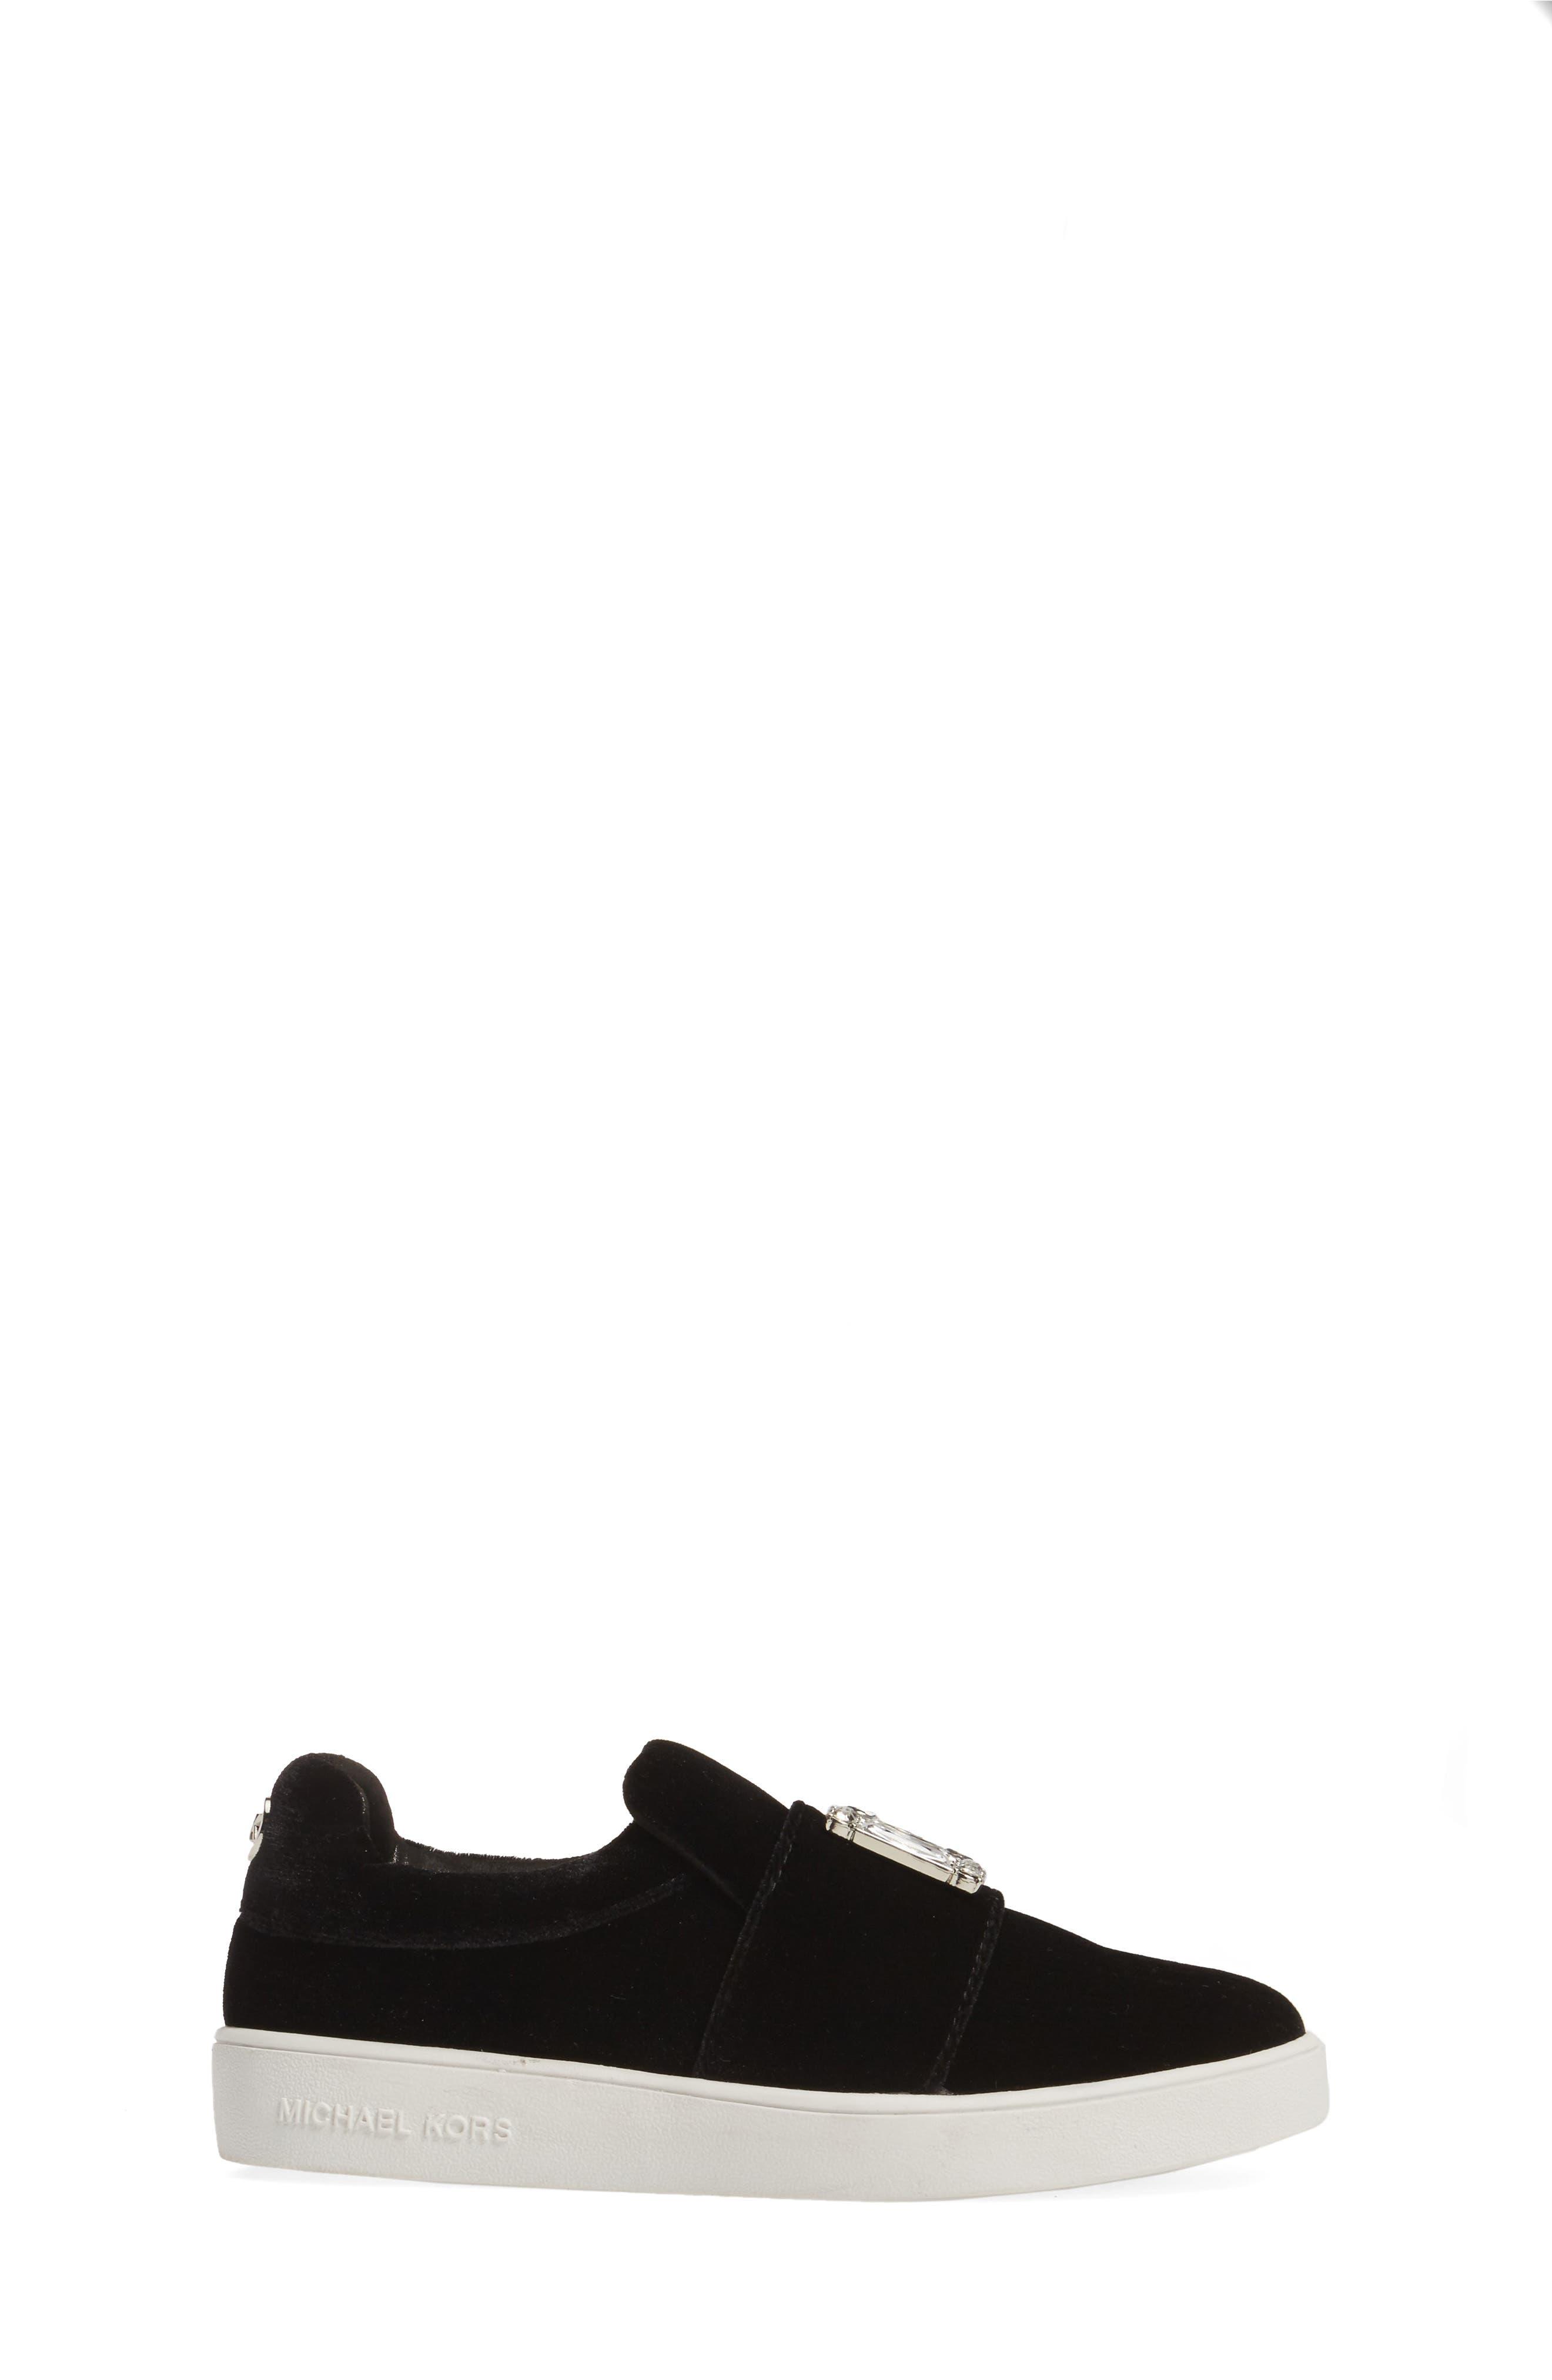 Ivy Dream Embellished Slip-On Sneaker,                             Alternate thumbnail 3, color,                             001